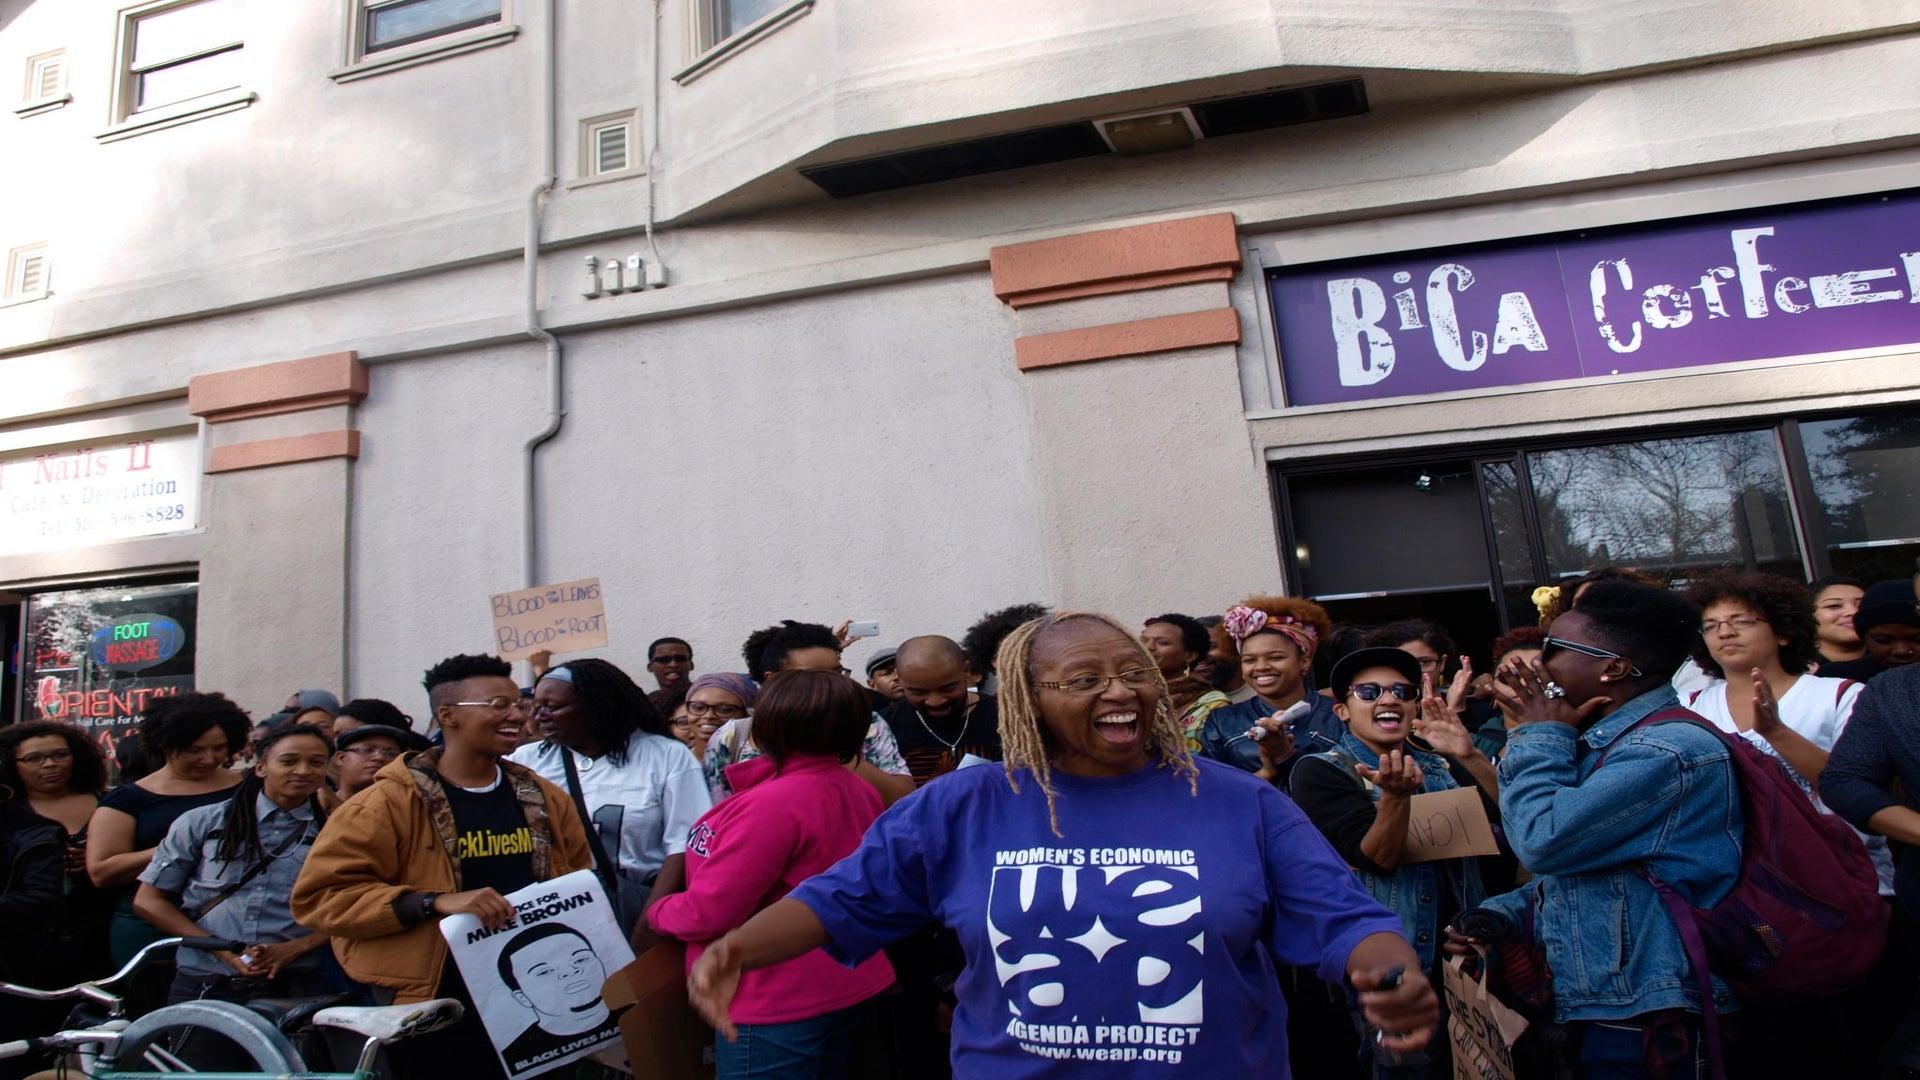 #BlackBrunch Protestors Demonstrate at 'White' Brunch Spots